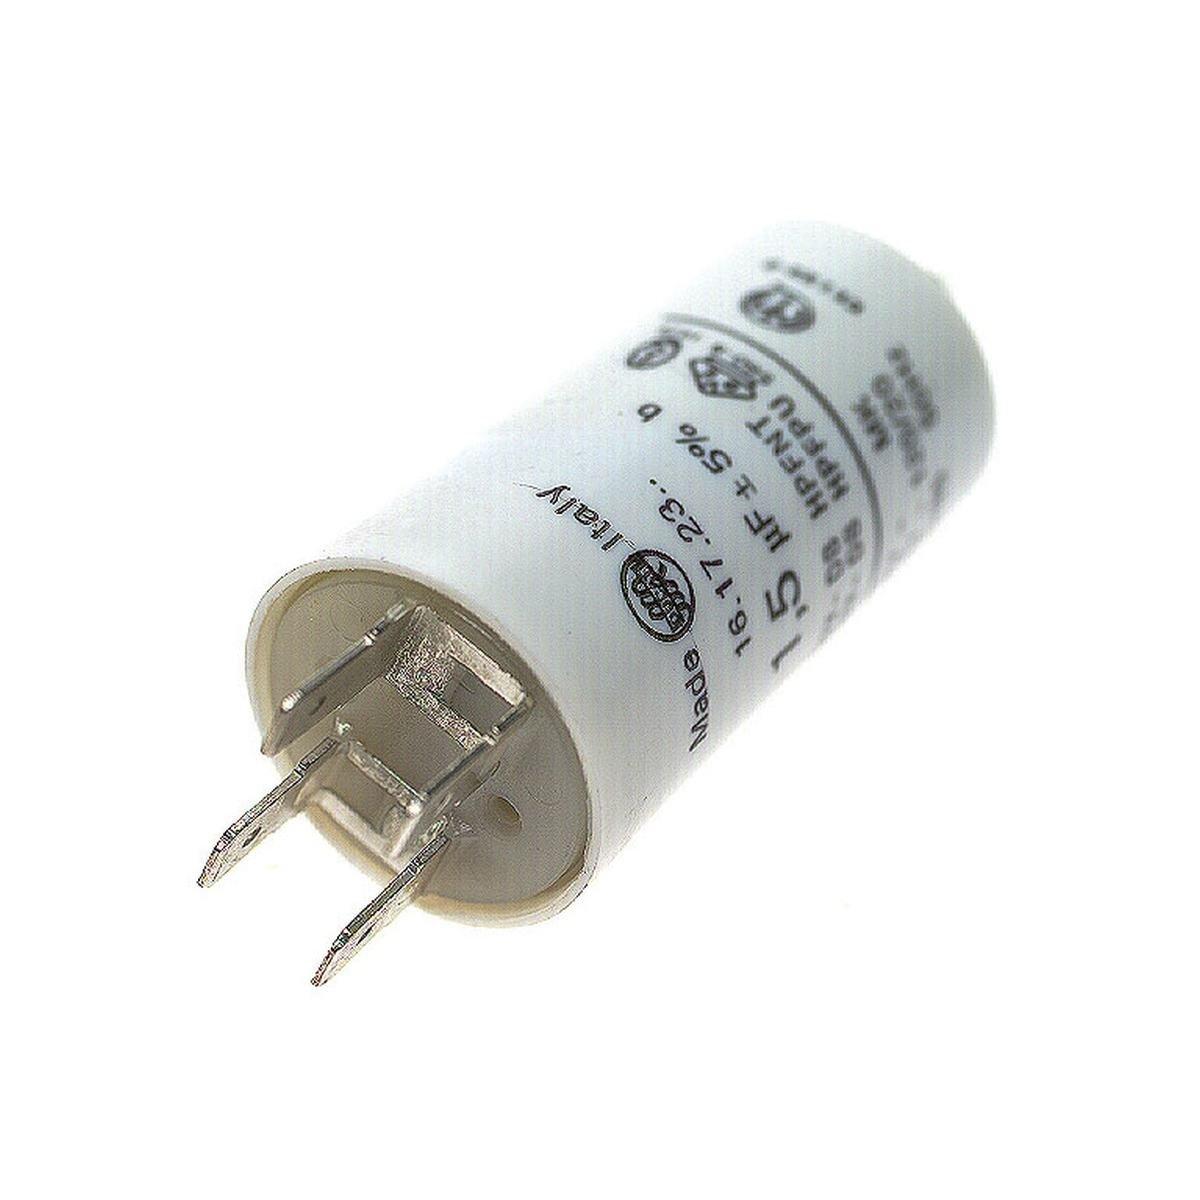 Kondensator 6,0 µF 450V